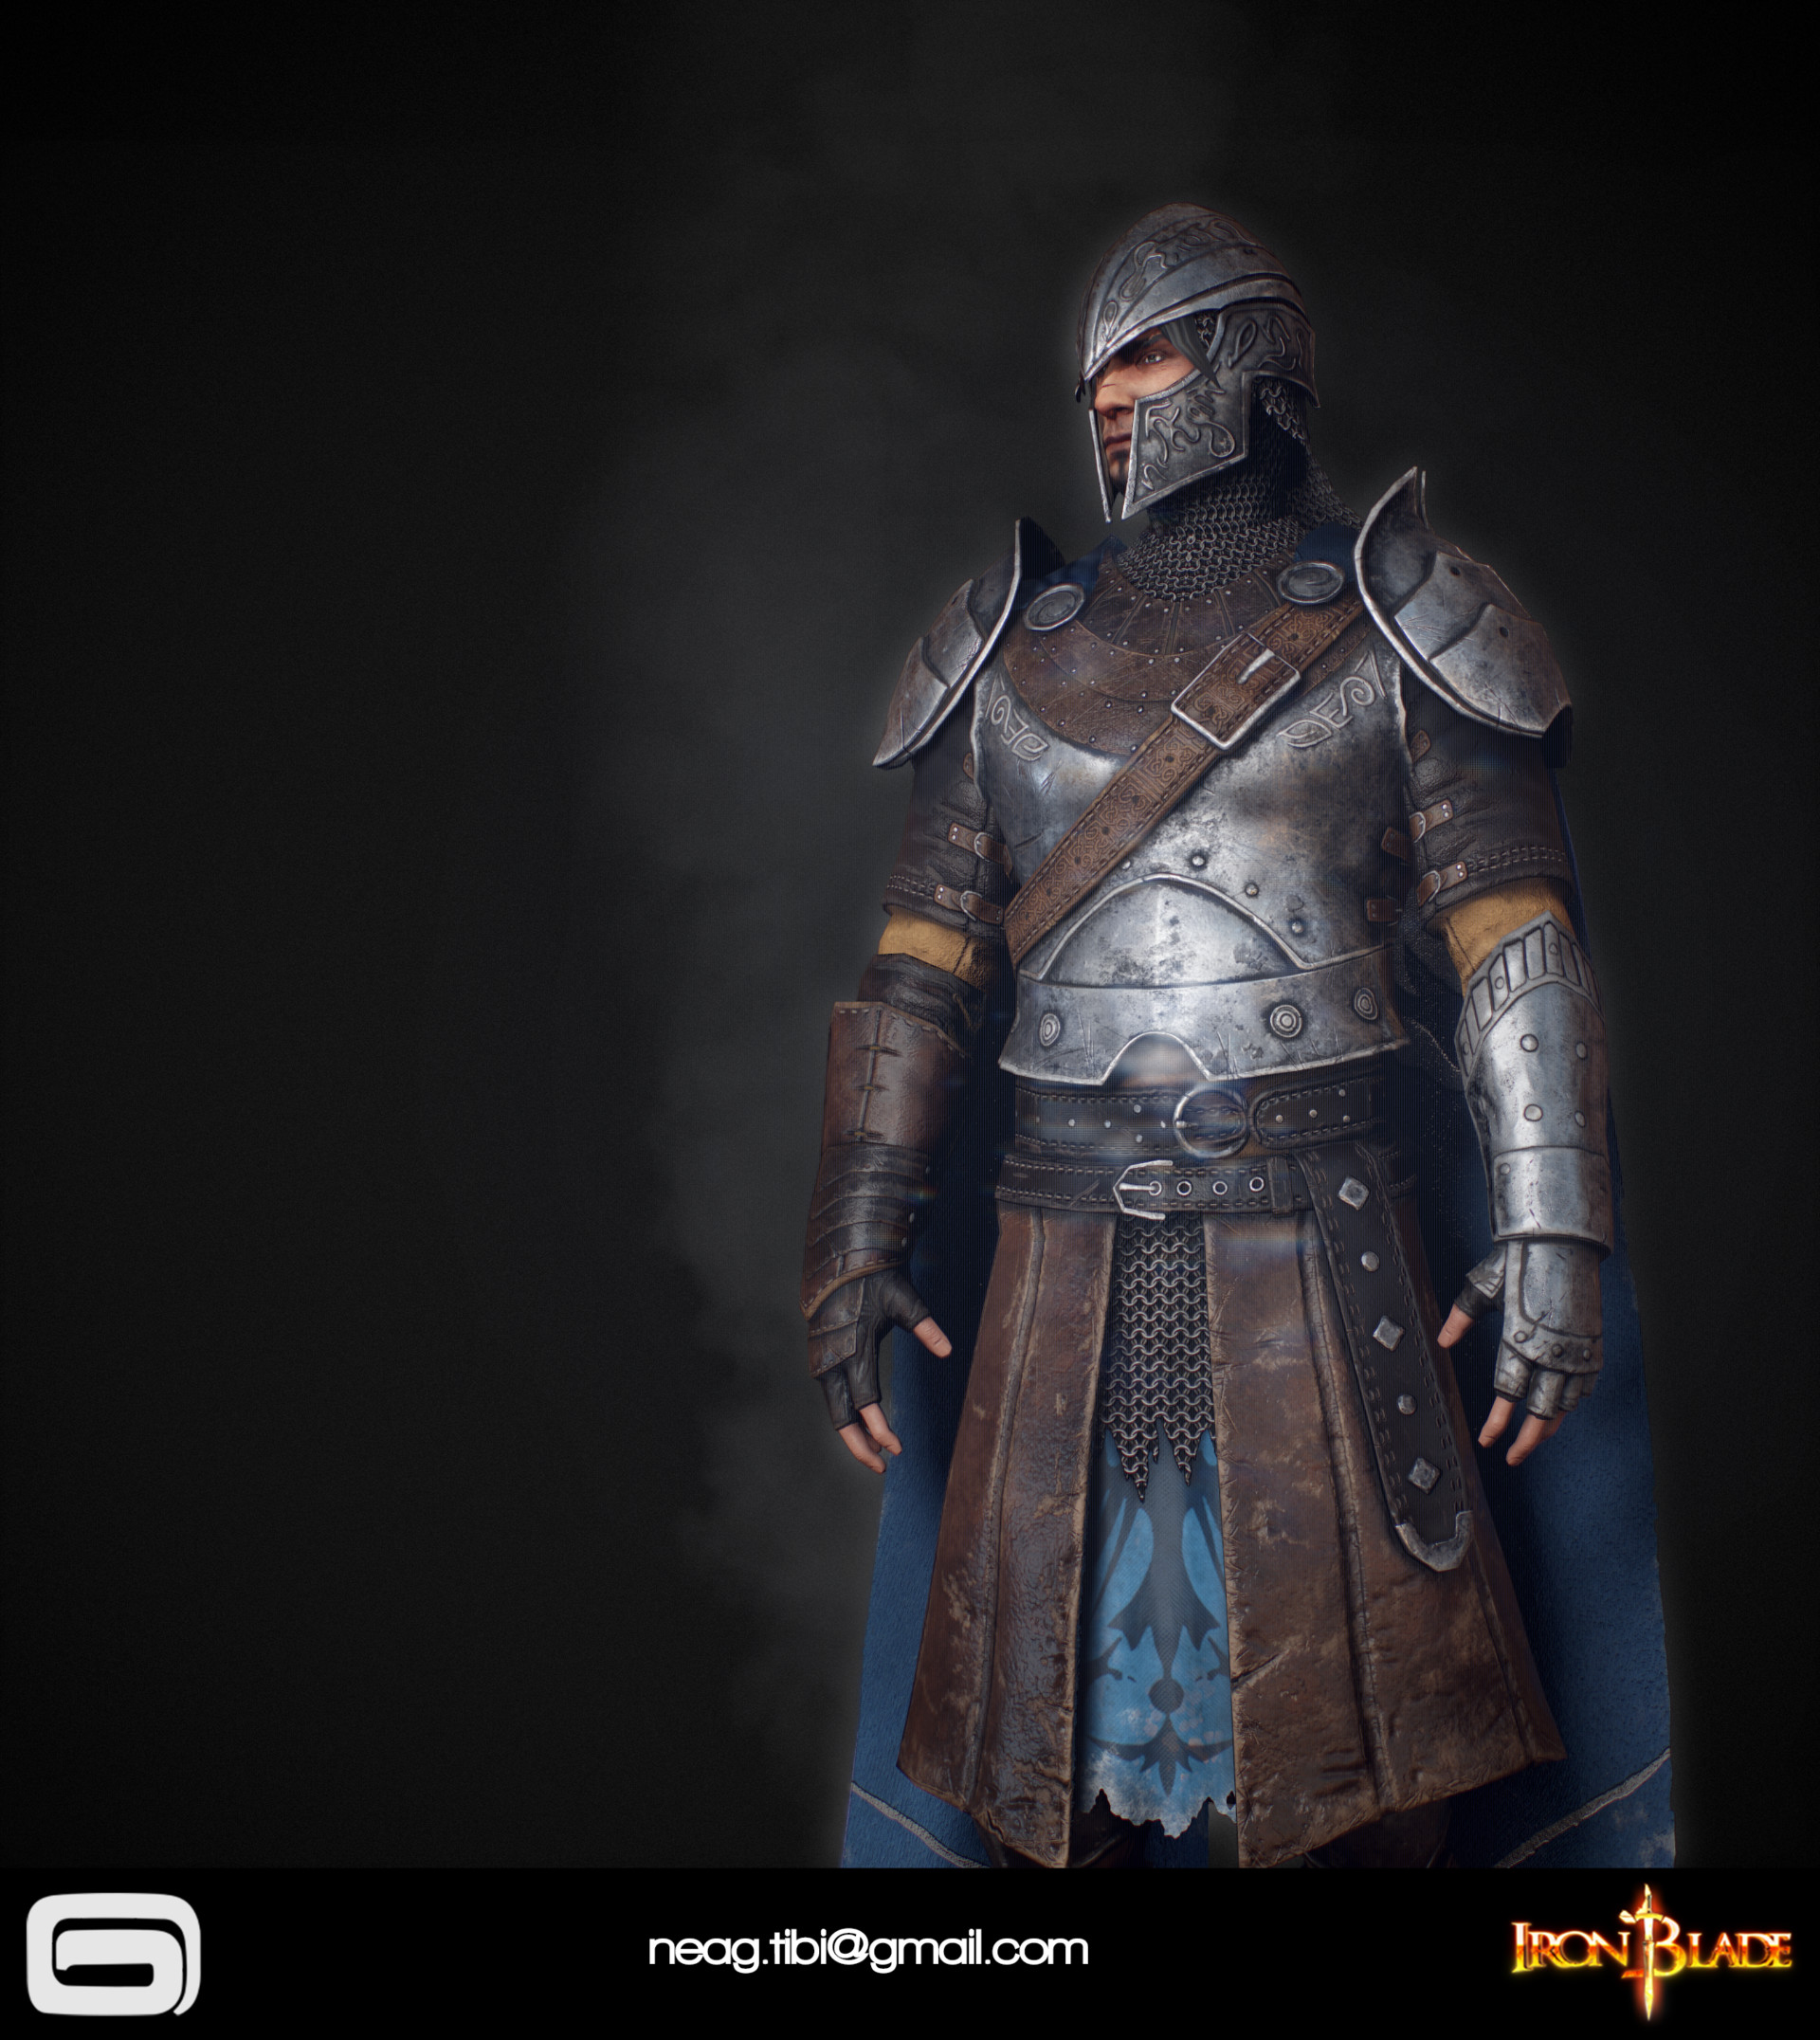 Tibi neag tibi neag iron blade mc armor 09b low poly 04